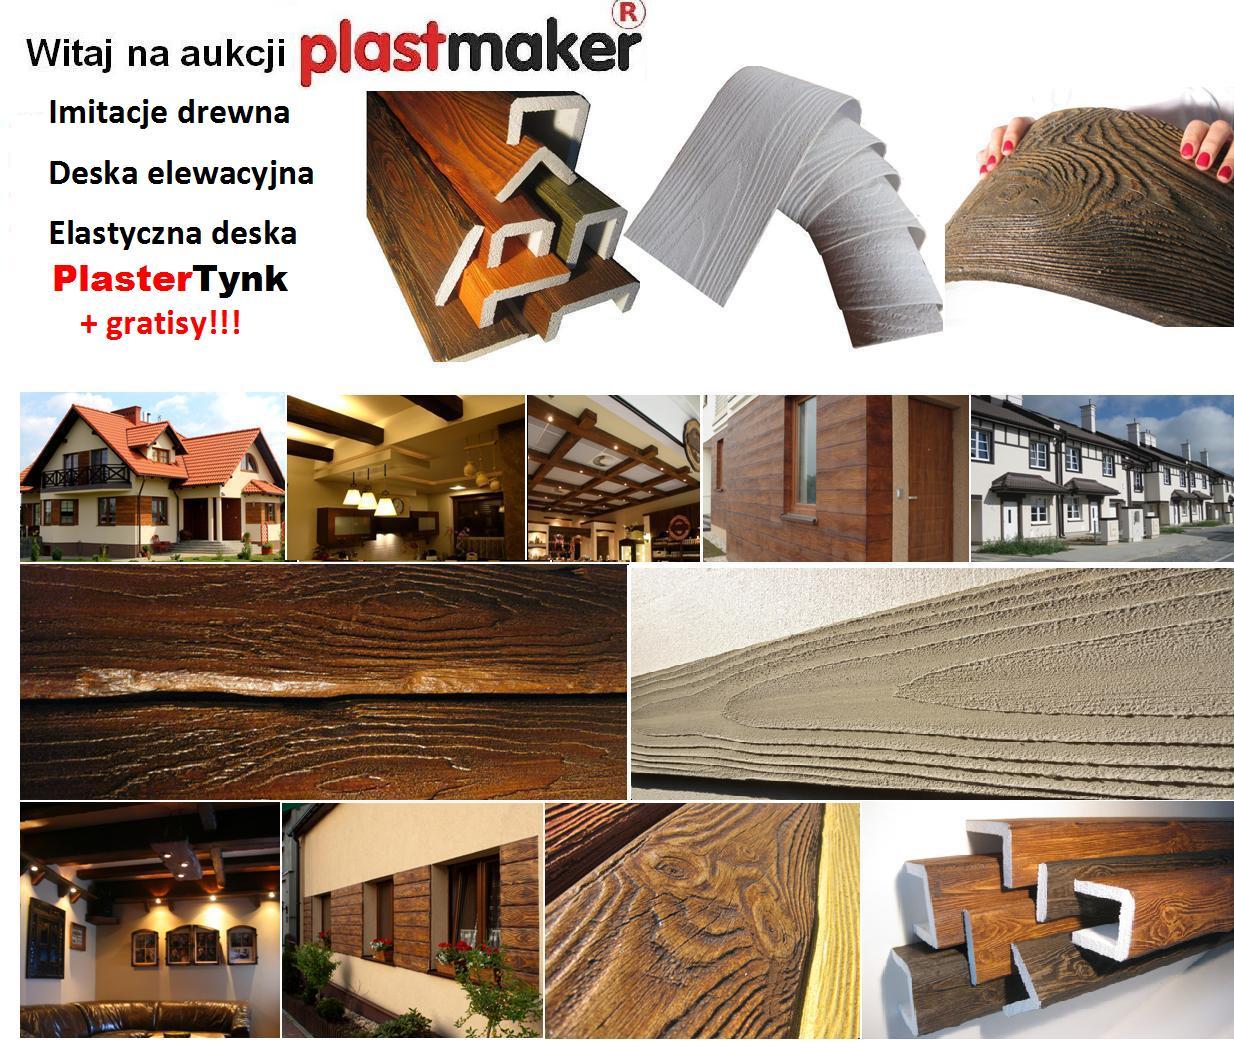 Plaster Tynk Allegro Imitacja Drewna Allegro Imitacja Drewna